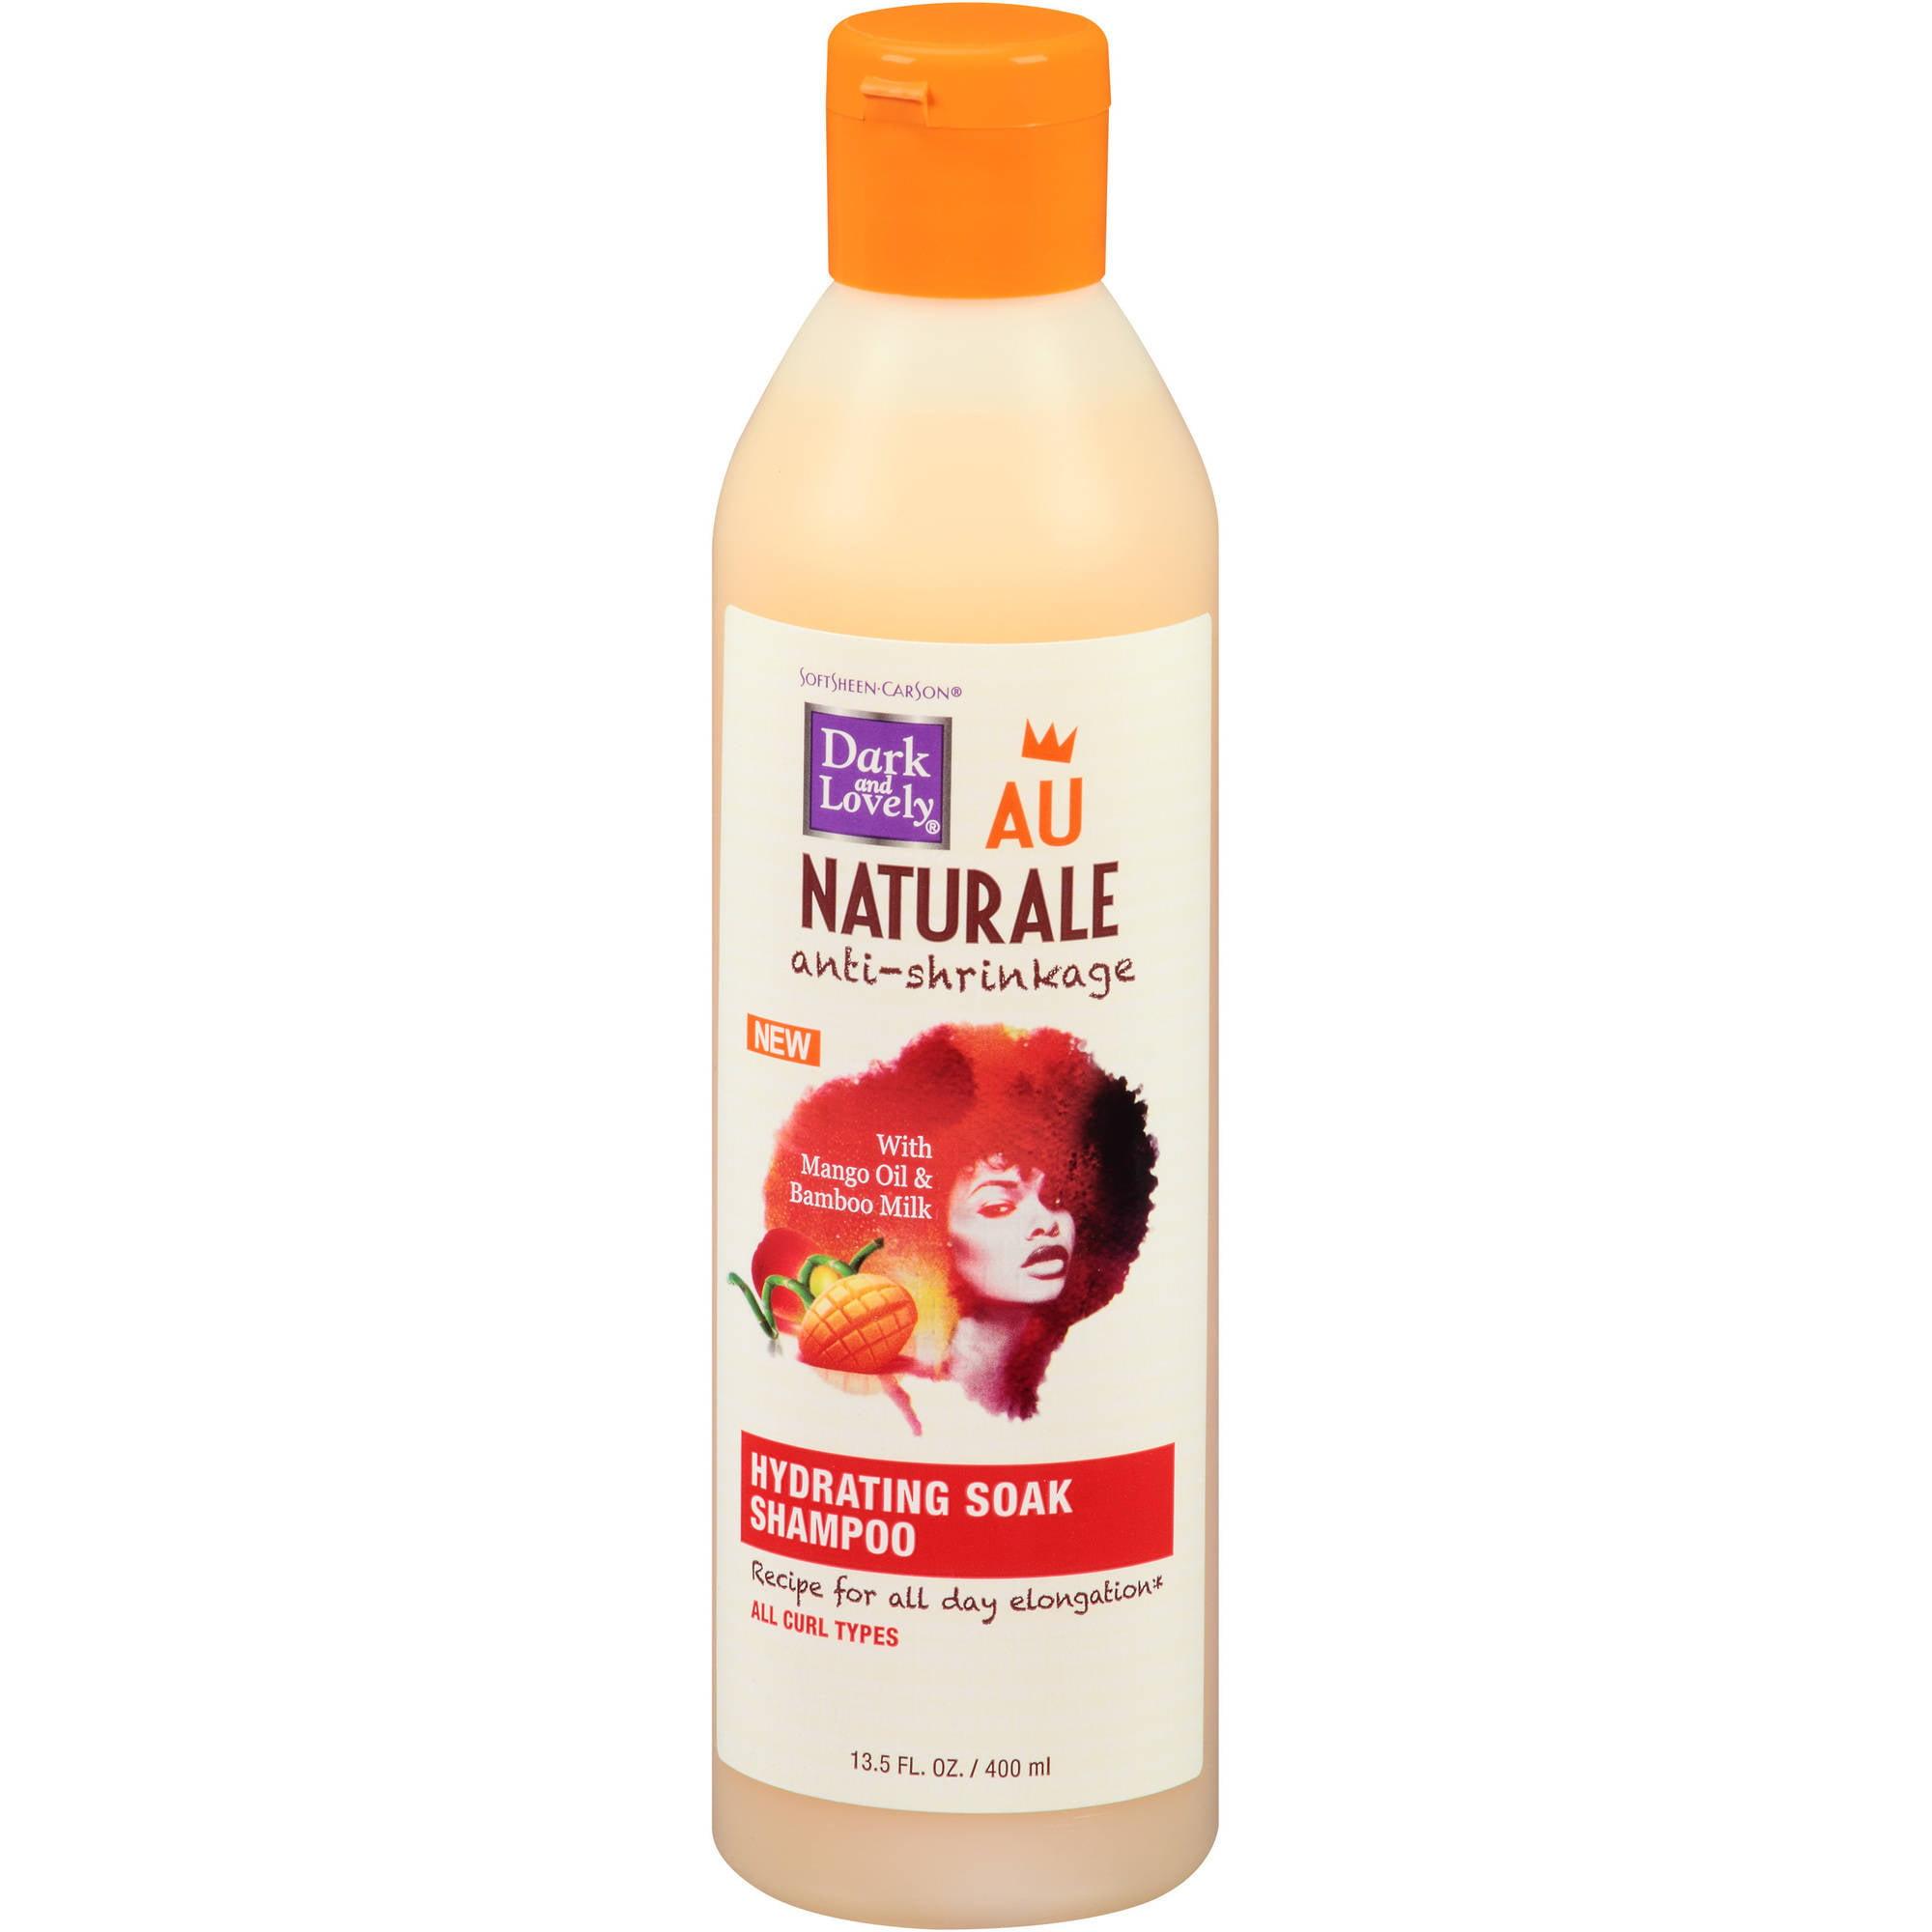 dark lovely au naturale anti shrinkage shampoo 13 5 fl